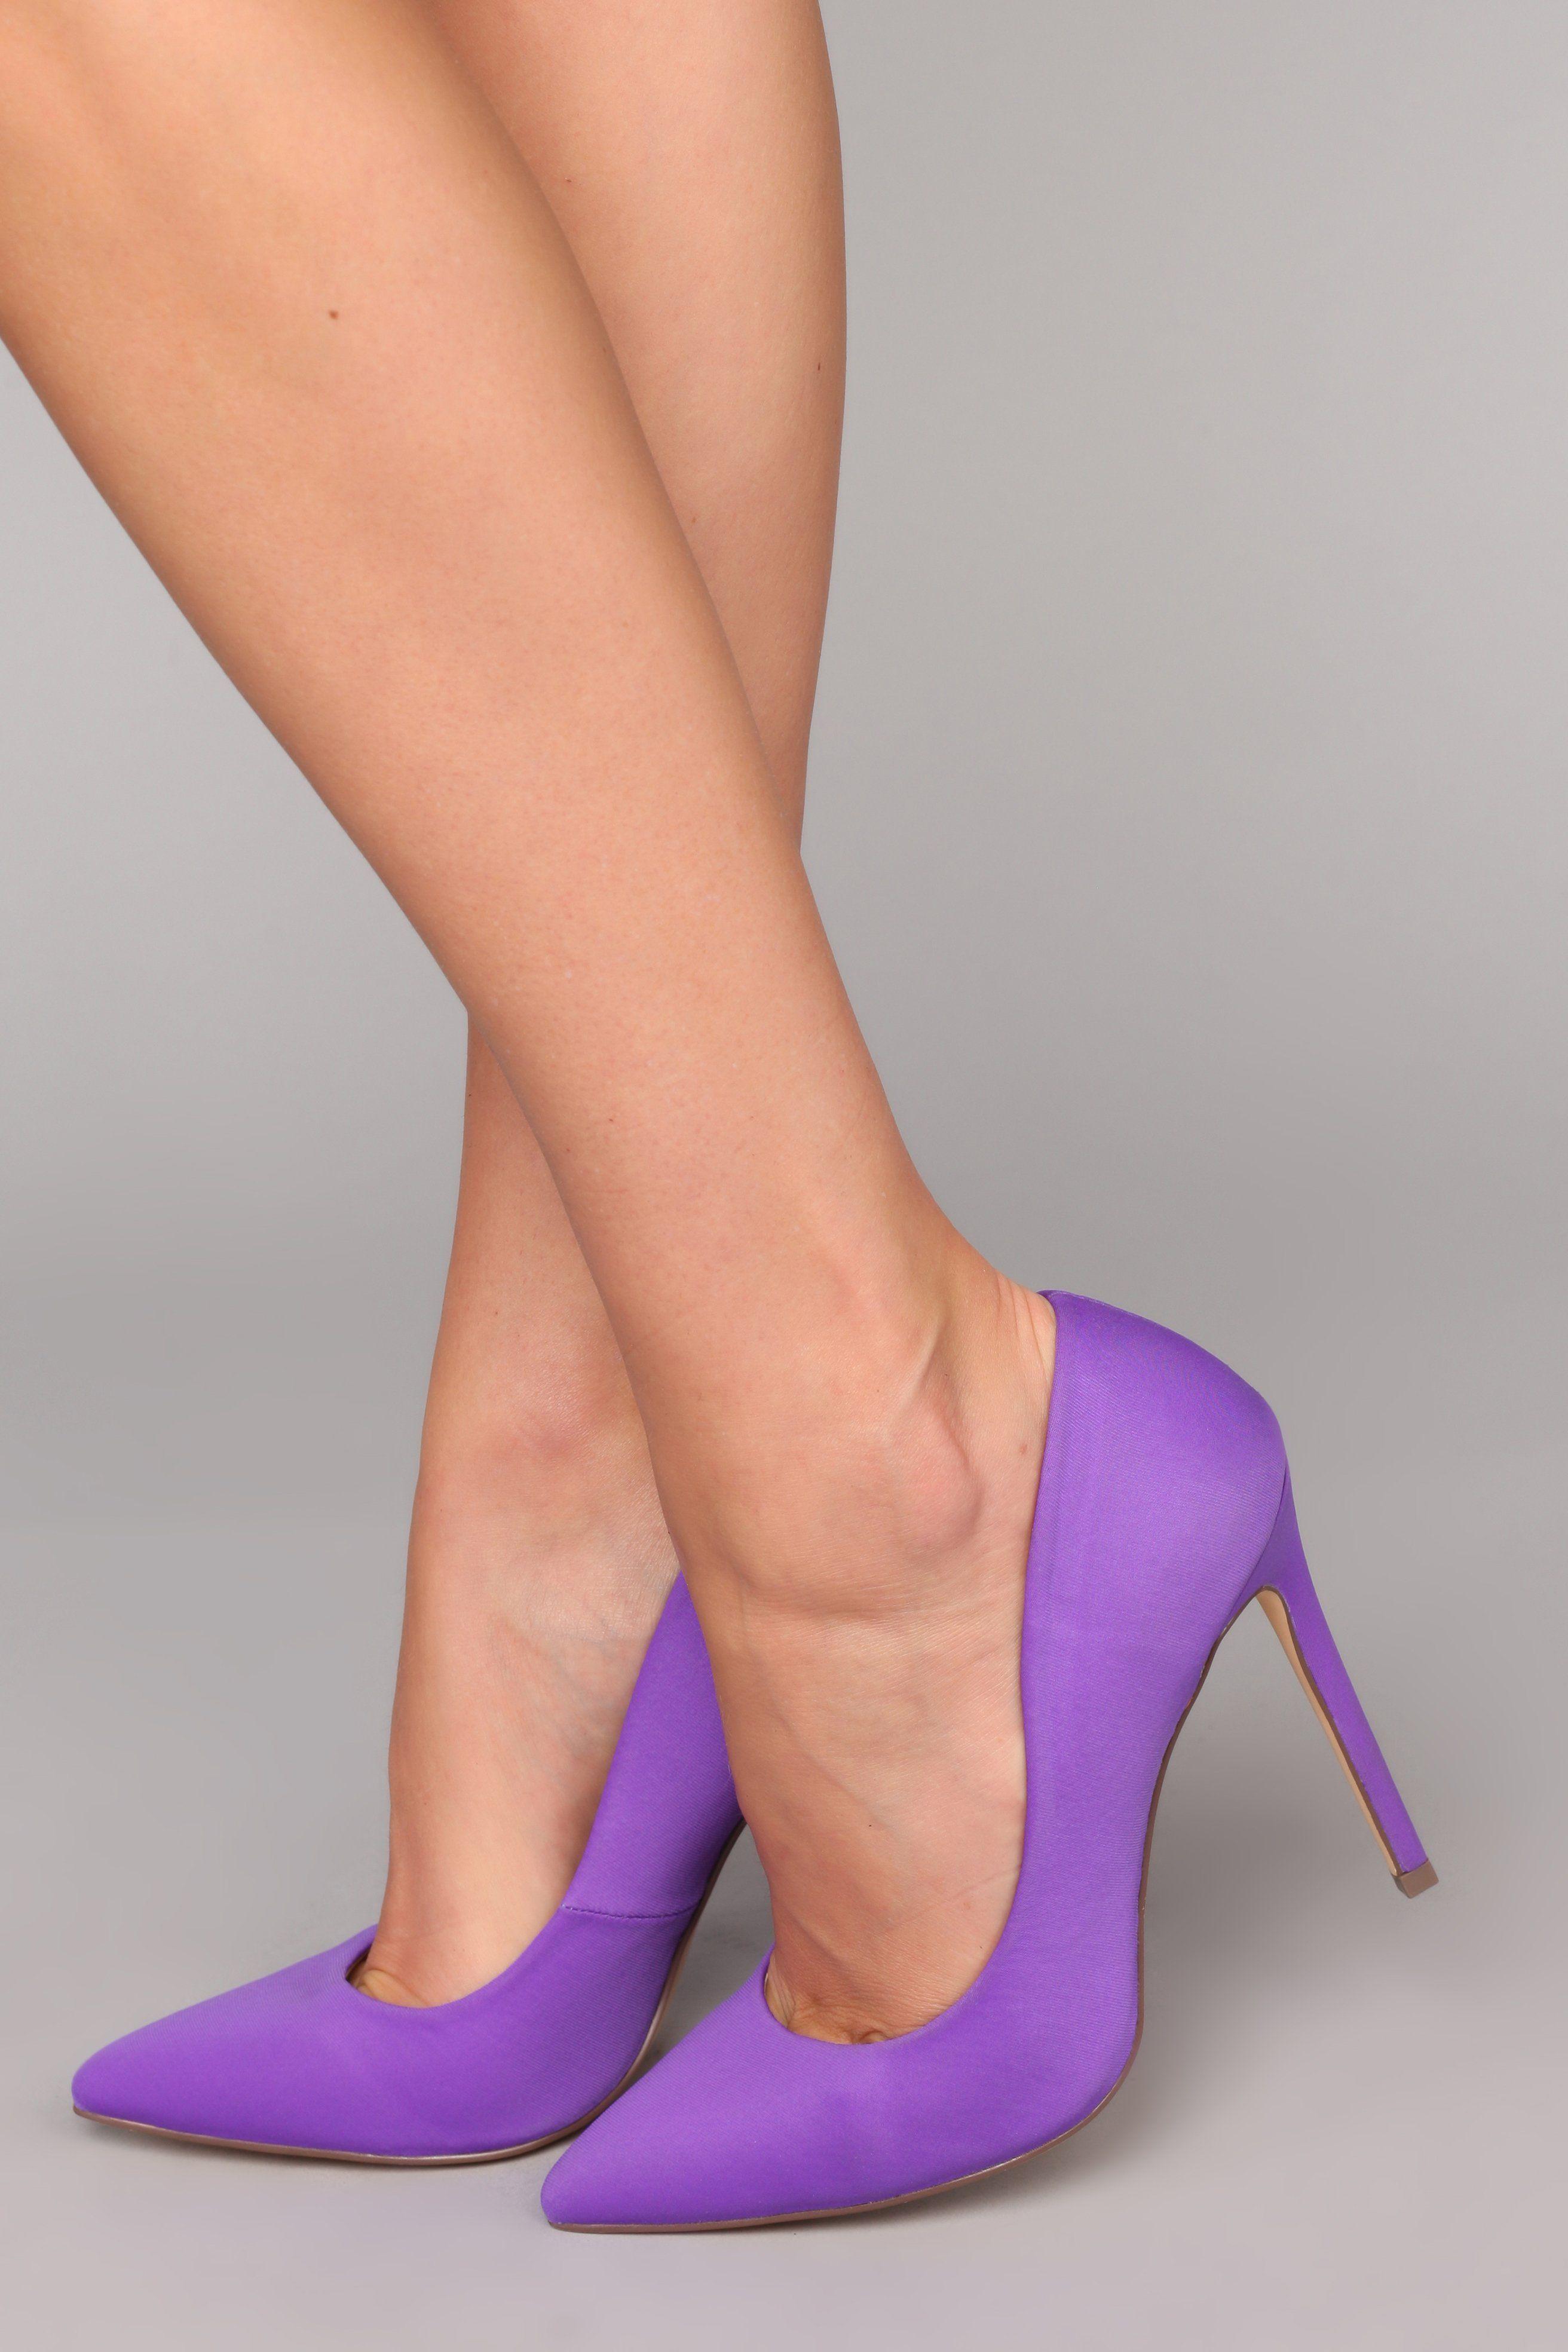 4 Inch Purple Heels